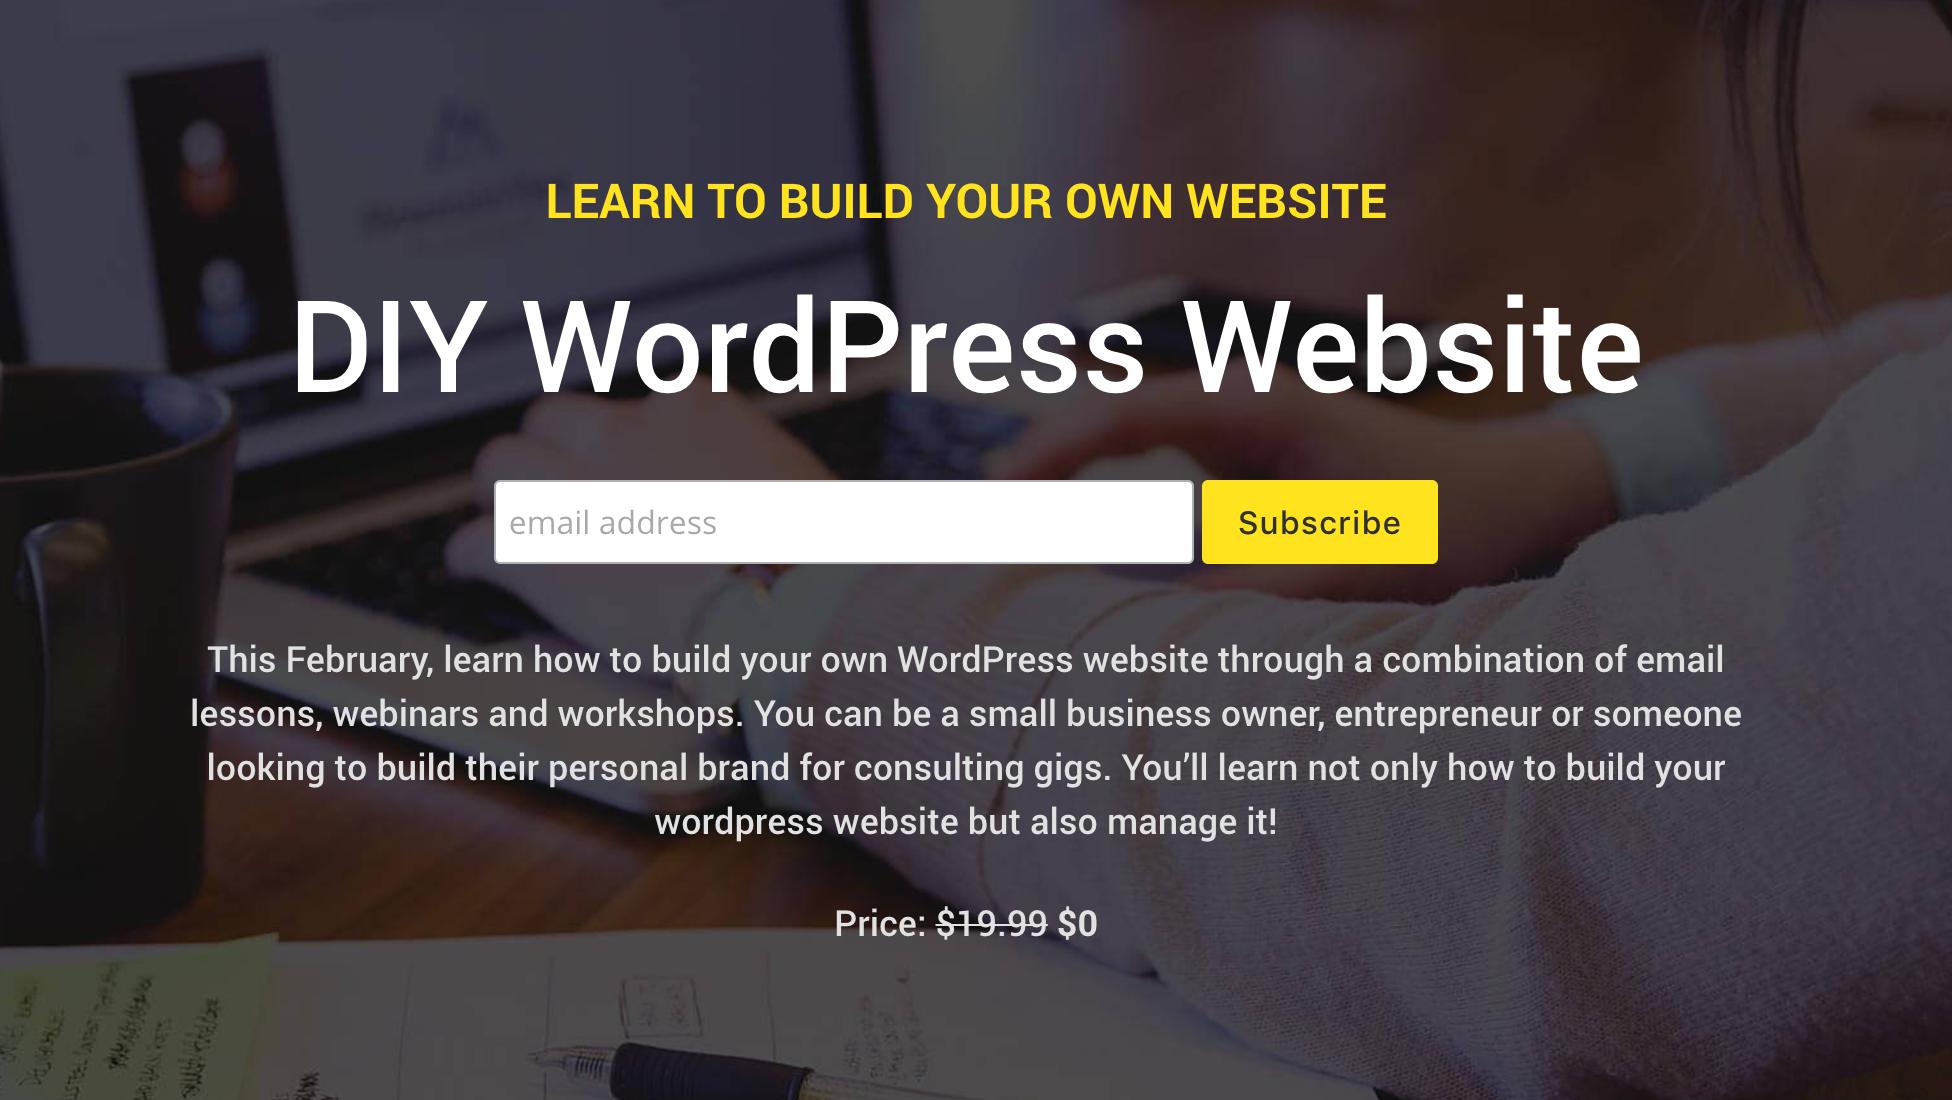 DIY Wordpress Website Course by DesignSingh - DesignSingh